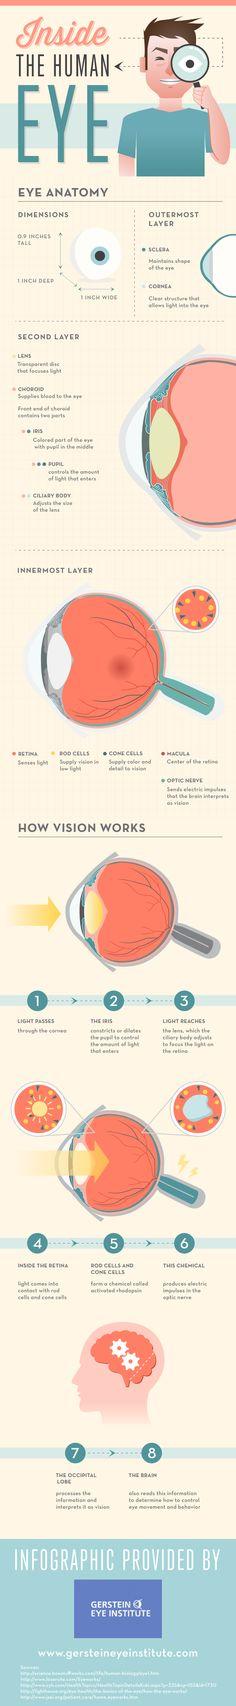 Ocular Anatomy Coloring Book : Gross anatomy of the eye by helga kolb u2013 webvision ophthalmology